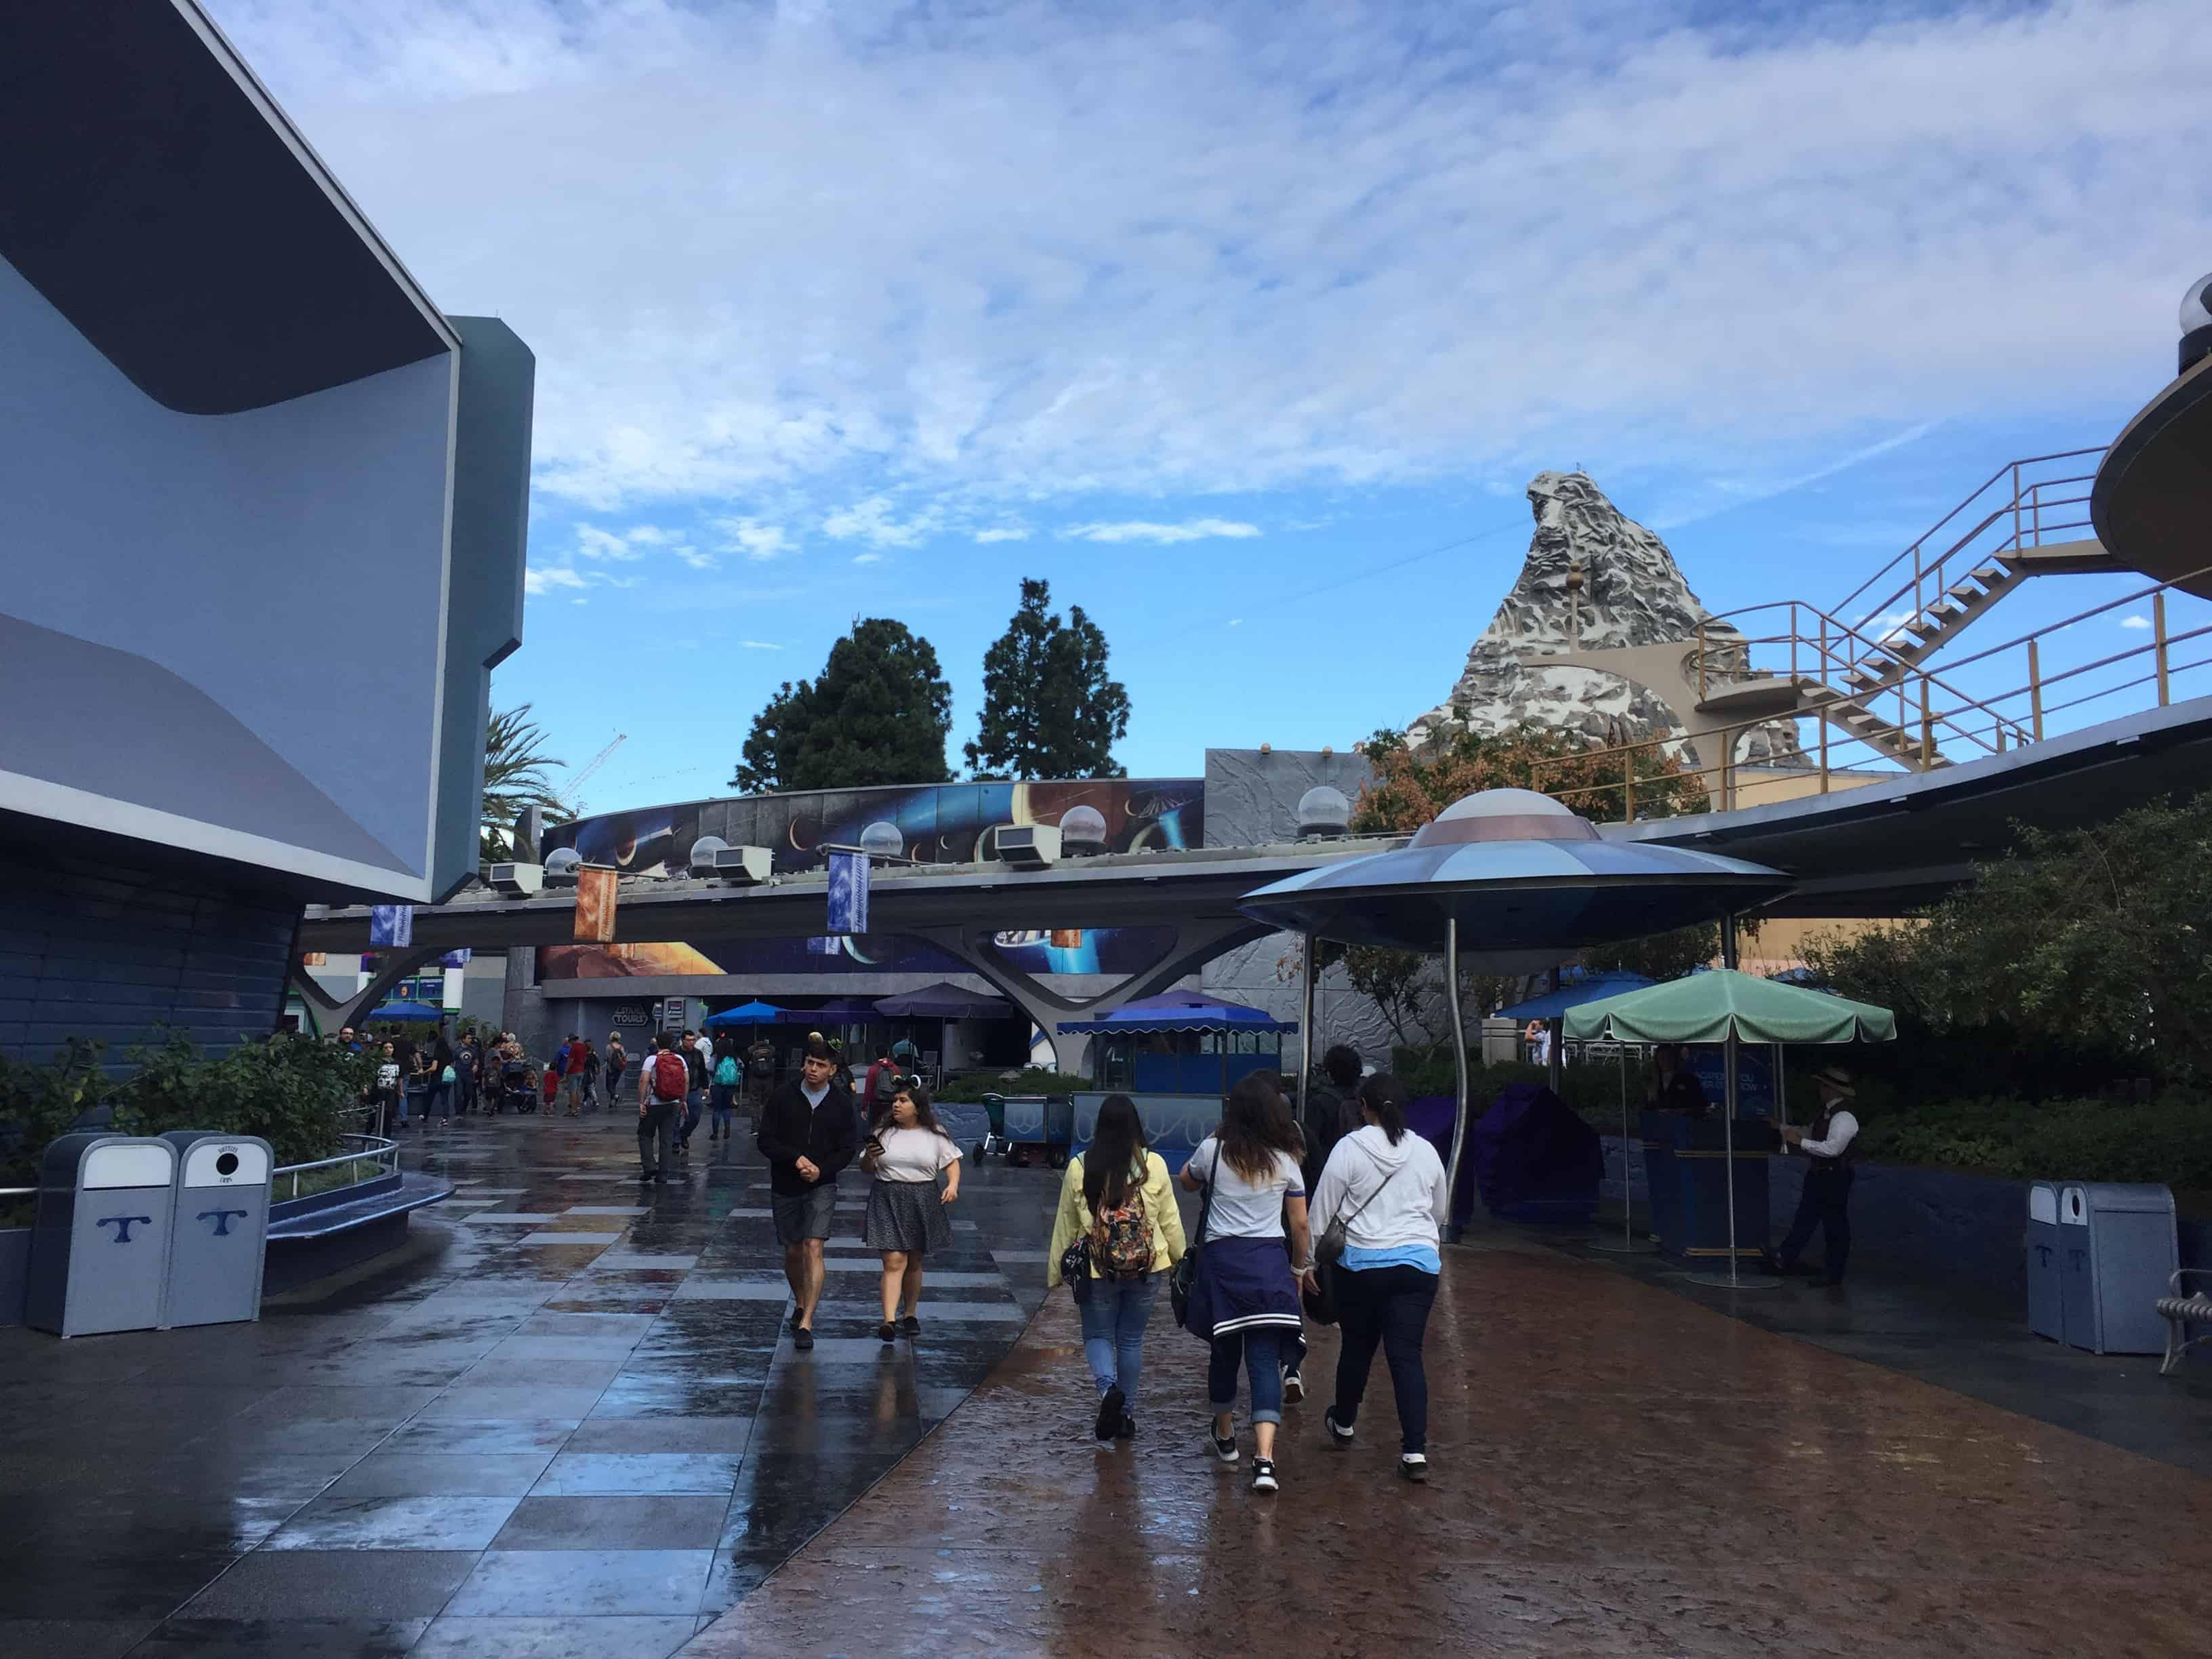 Disneyland after rain